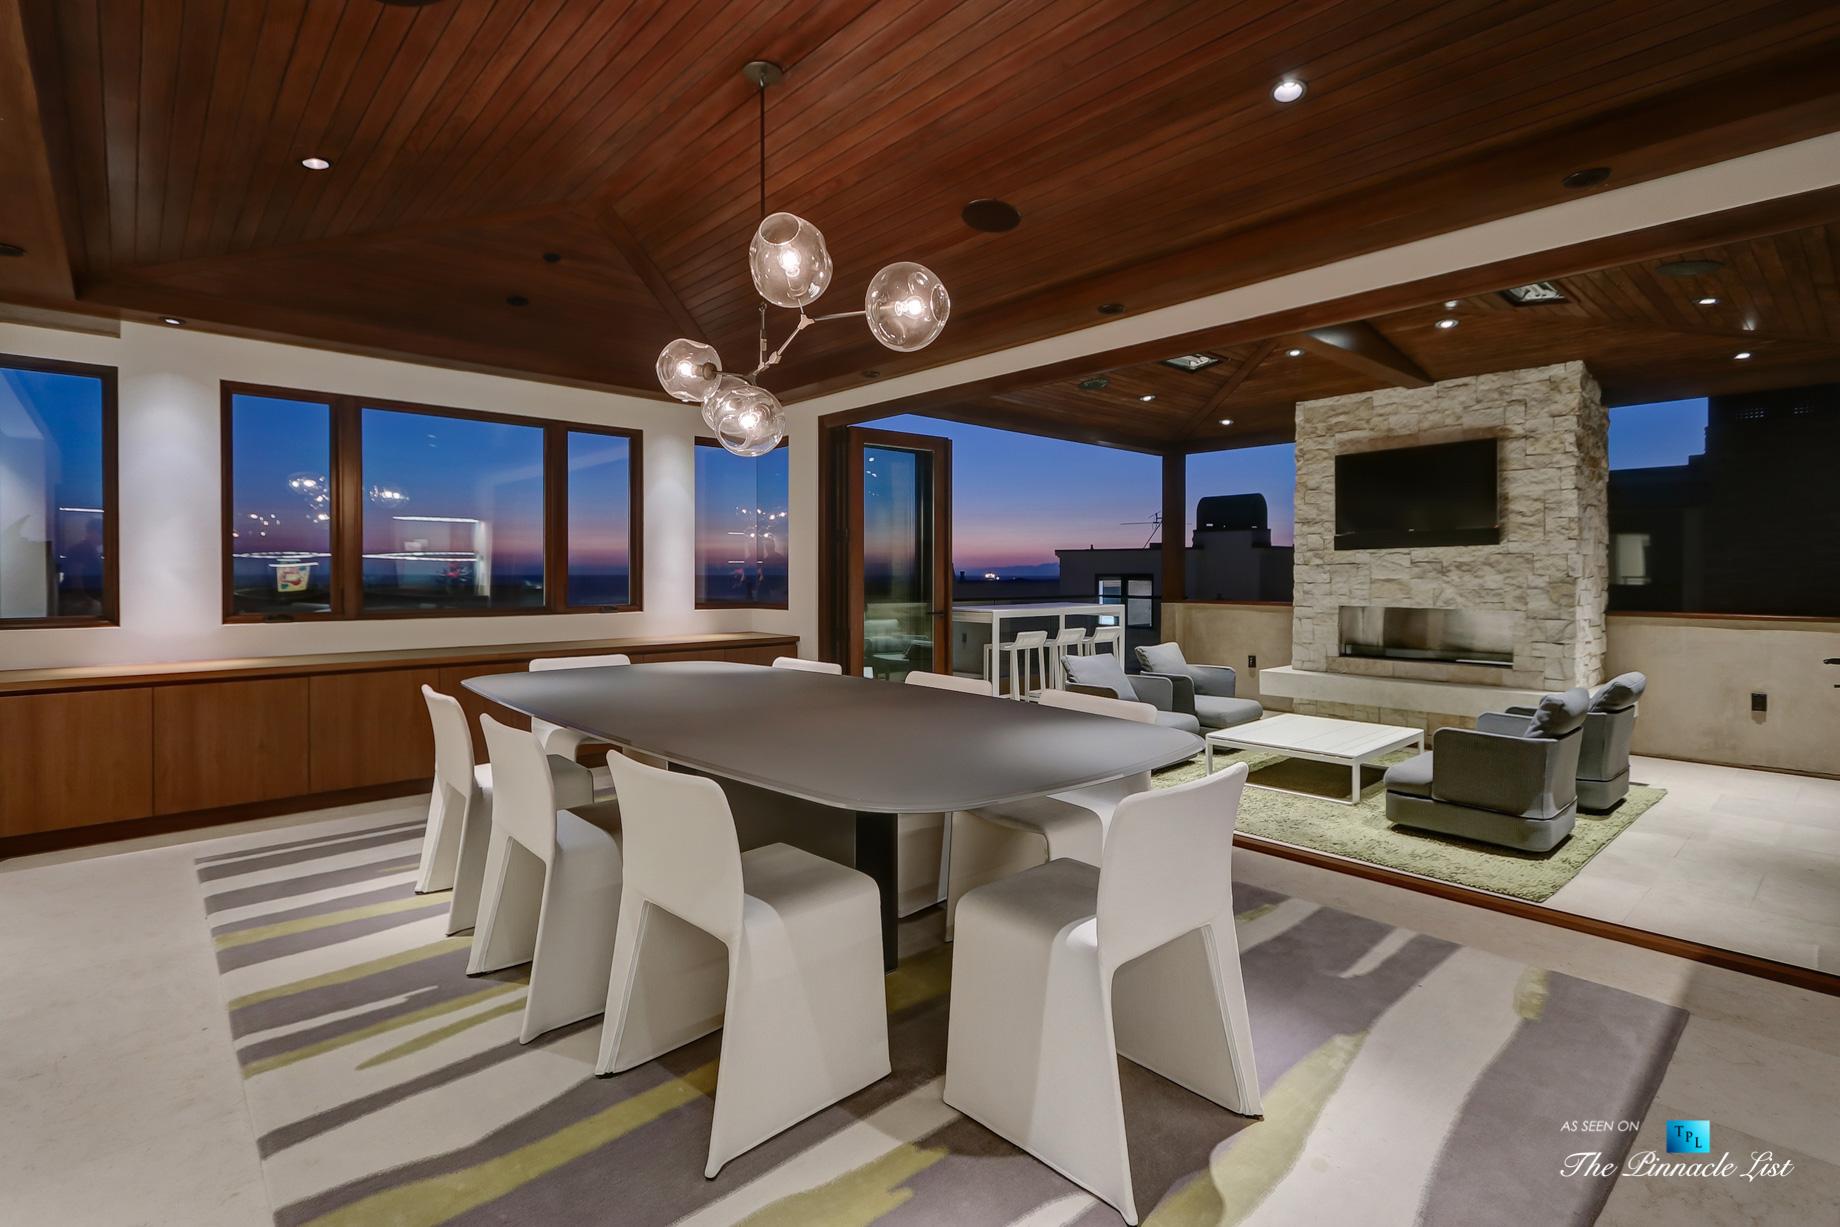 205 20th Street, Manhattan Beach, CA, USA – Night Dining Room – Luxury Real Estate – Ocean View Home